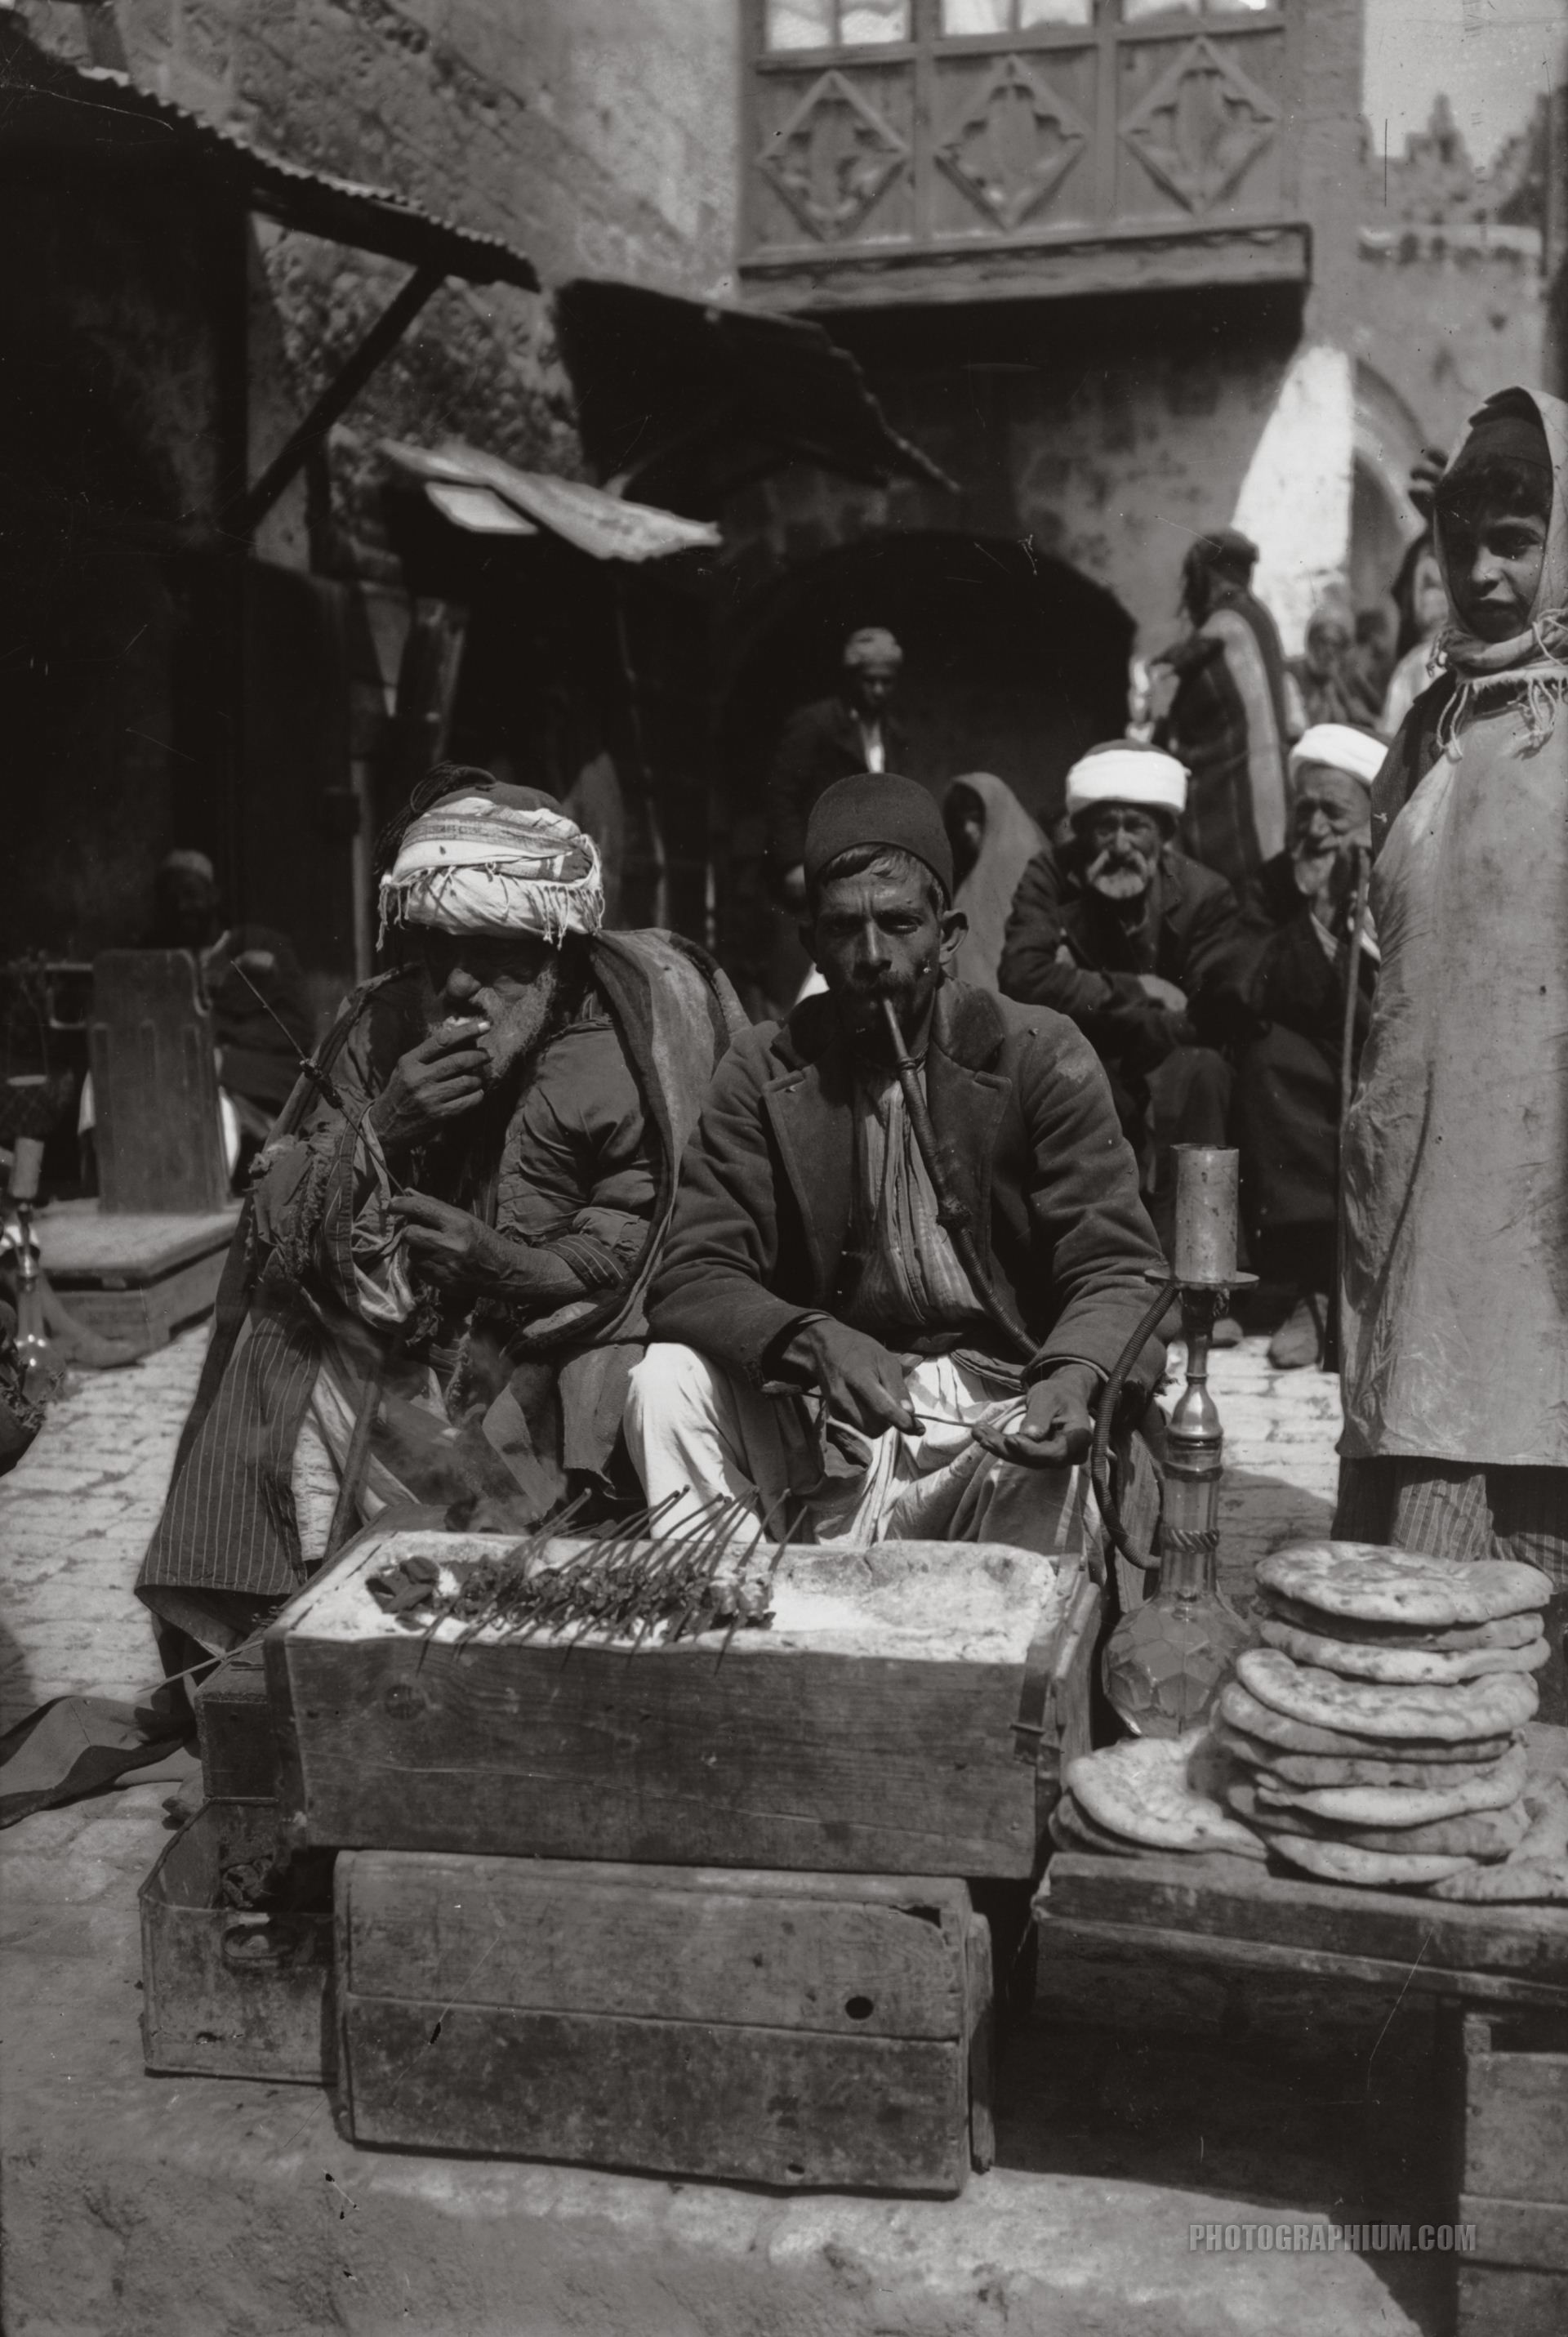 meatball vendor jerusalem palestine 1900 1920 natives